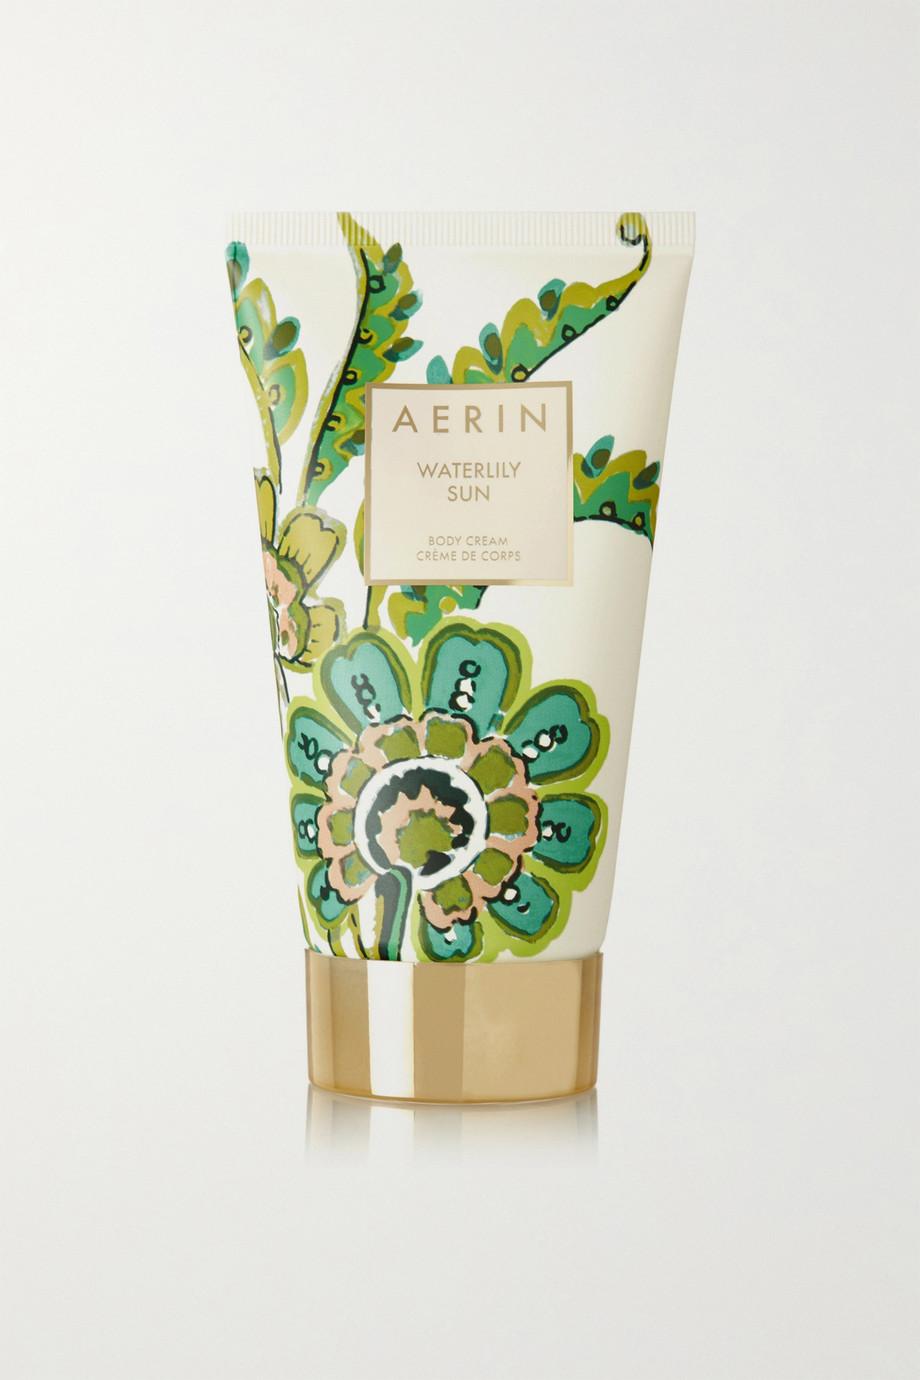 AERIN Beauty Waterlily Sun Body Cream, 150 ml – Körpercreme